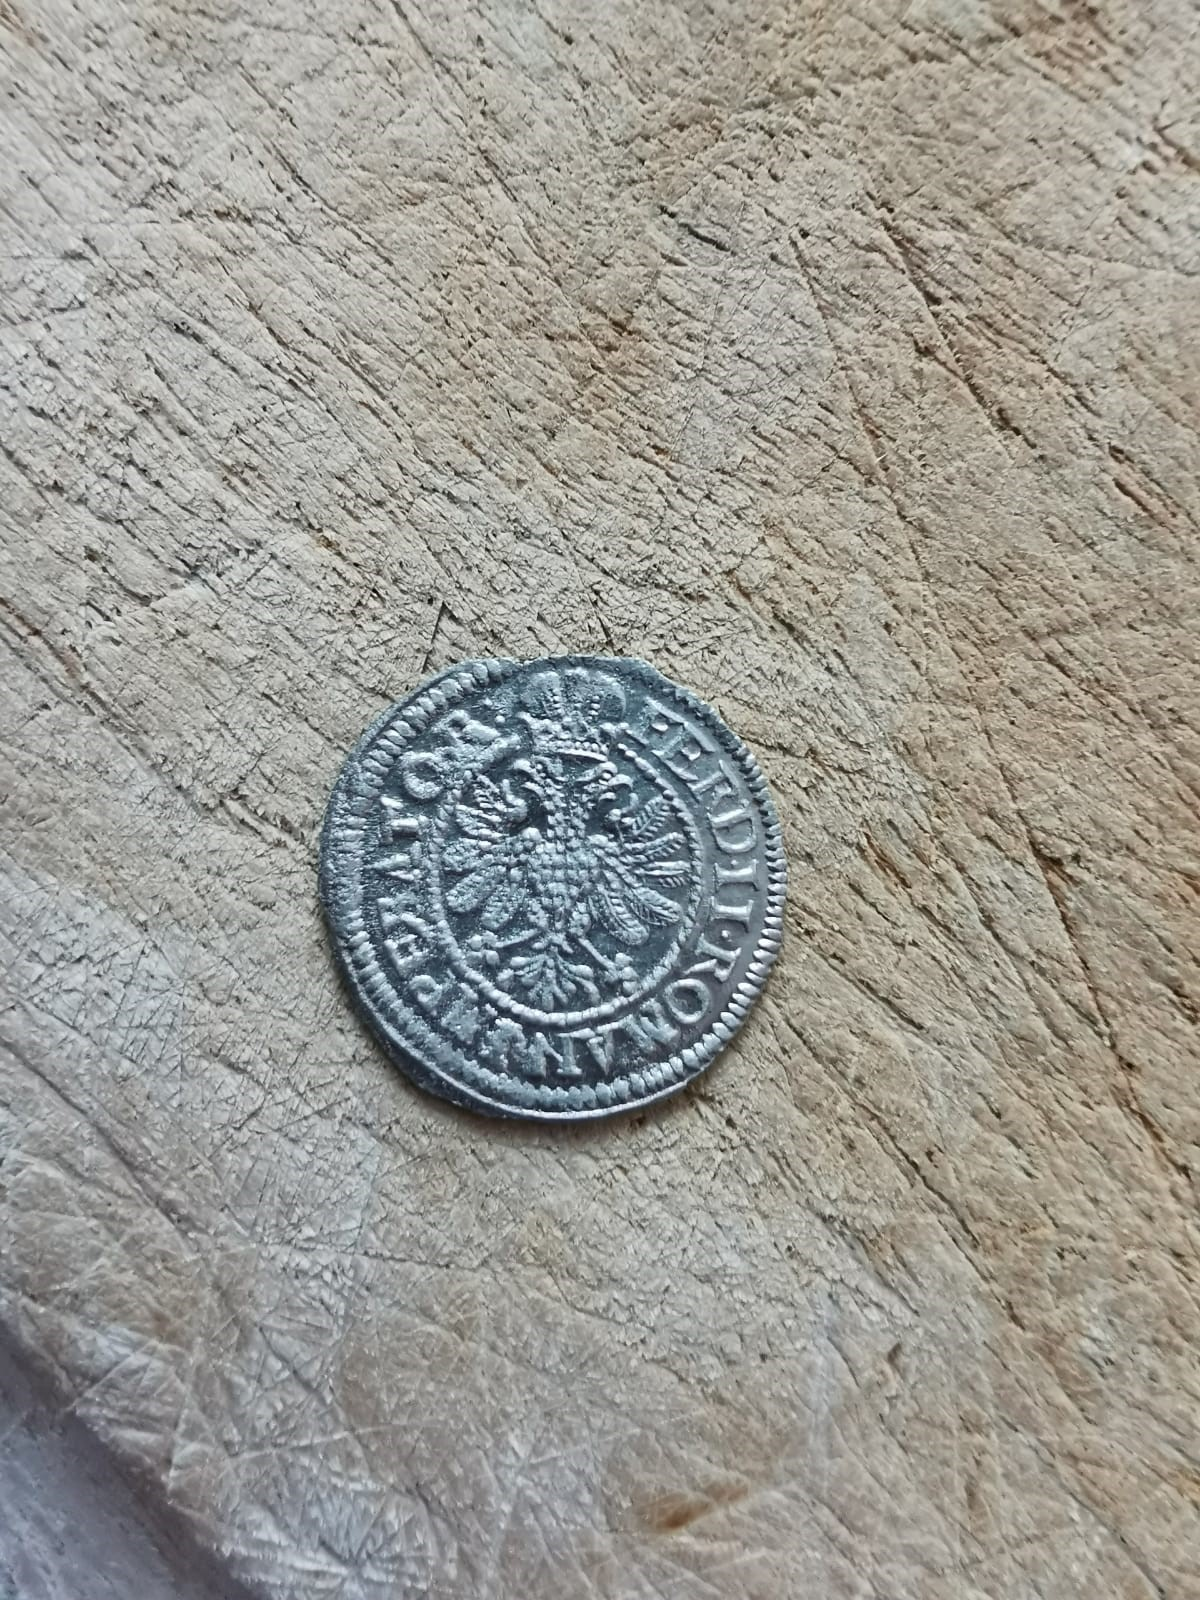 Münze 1.jpg